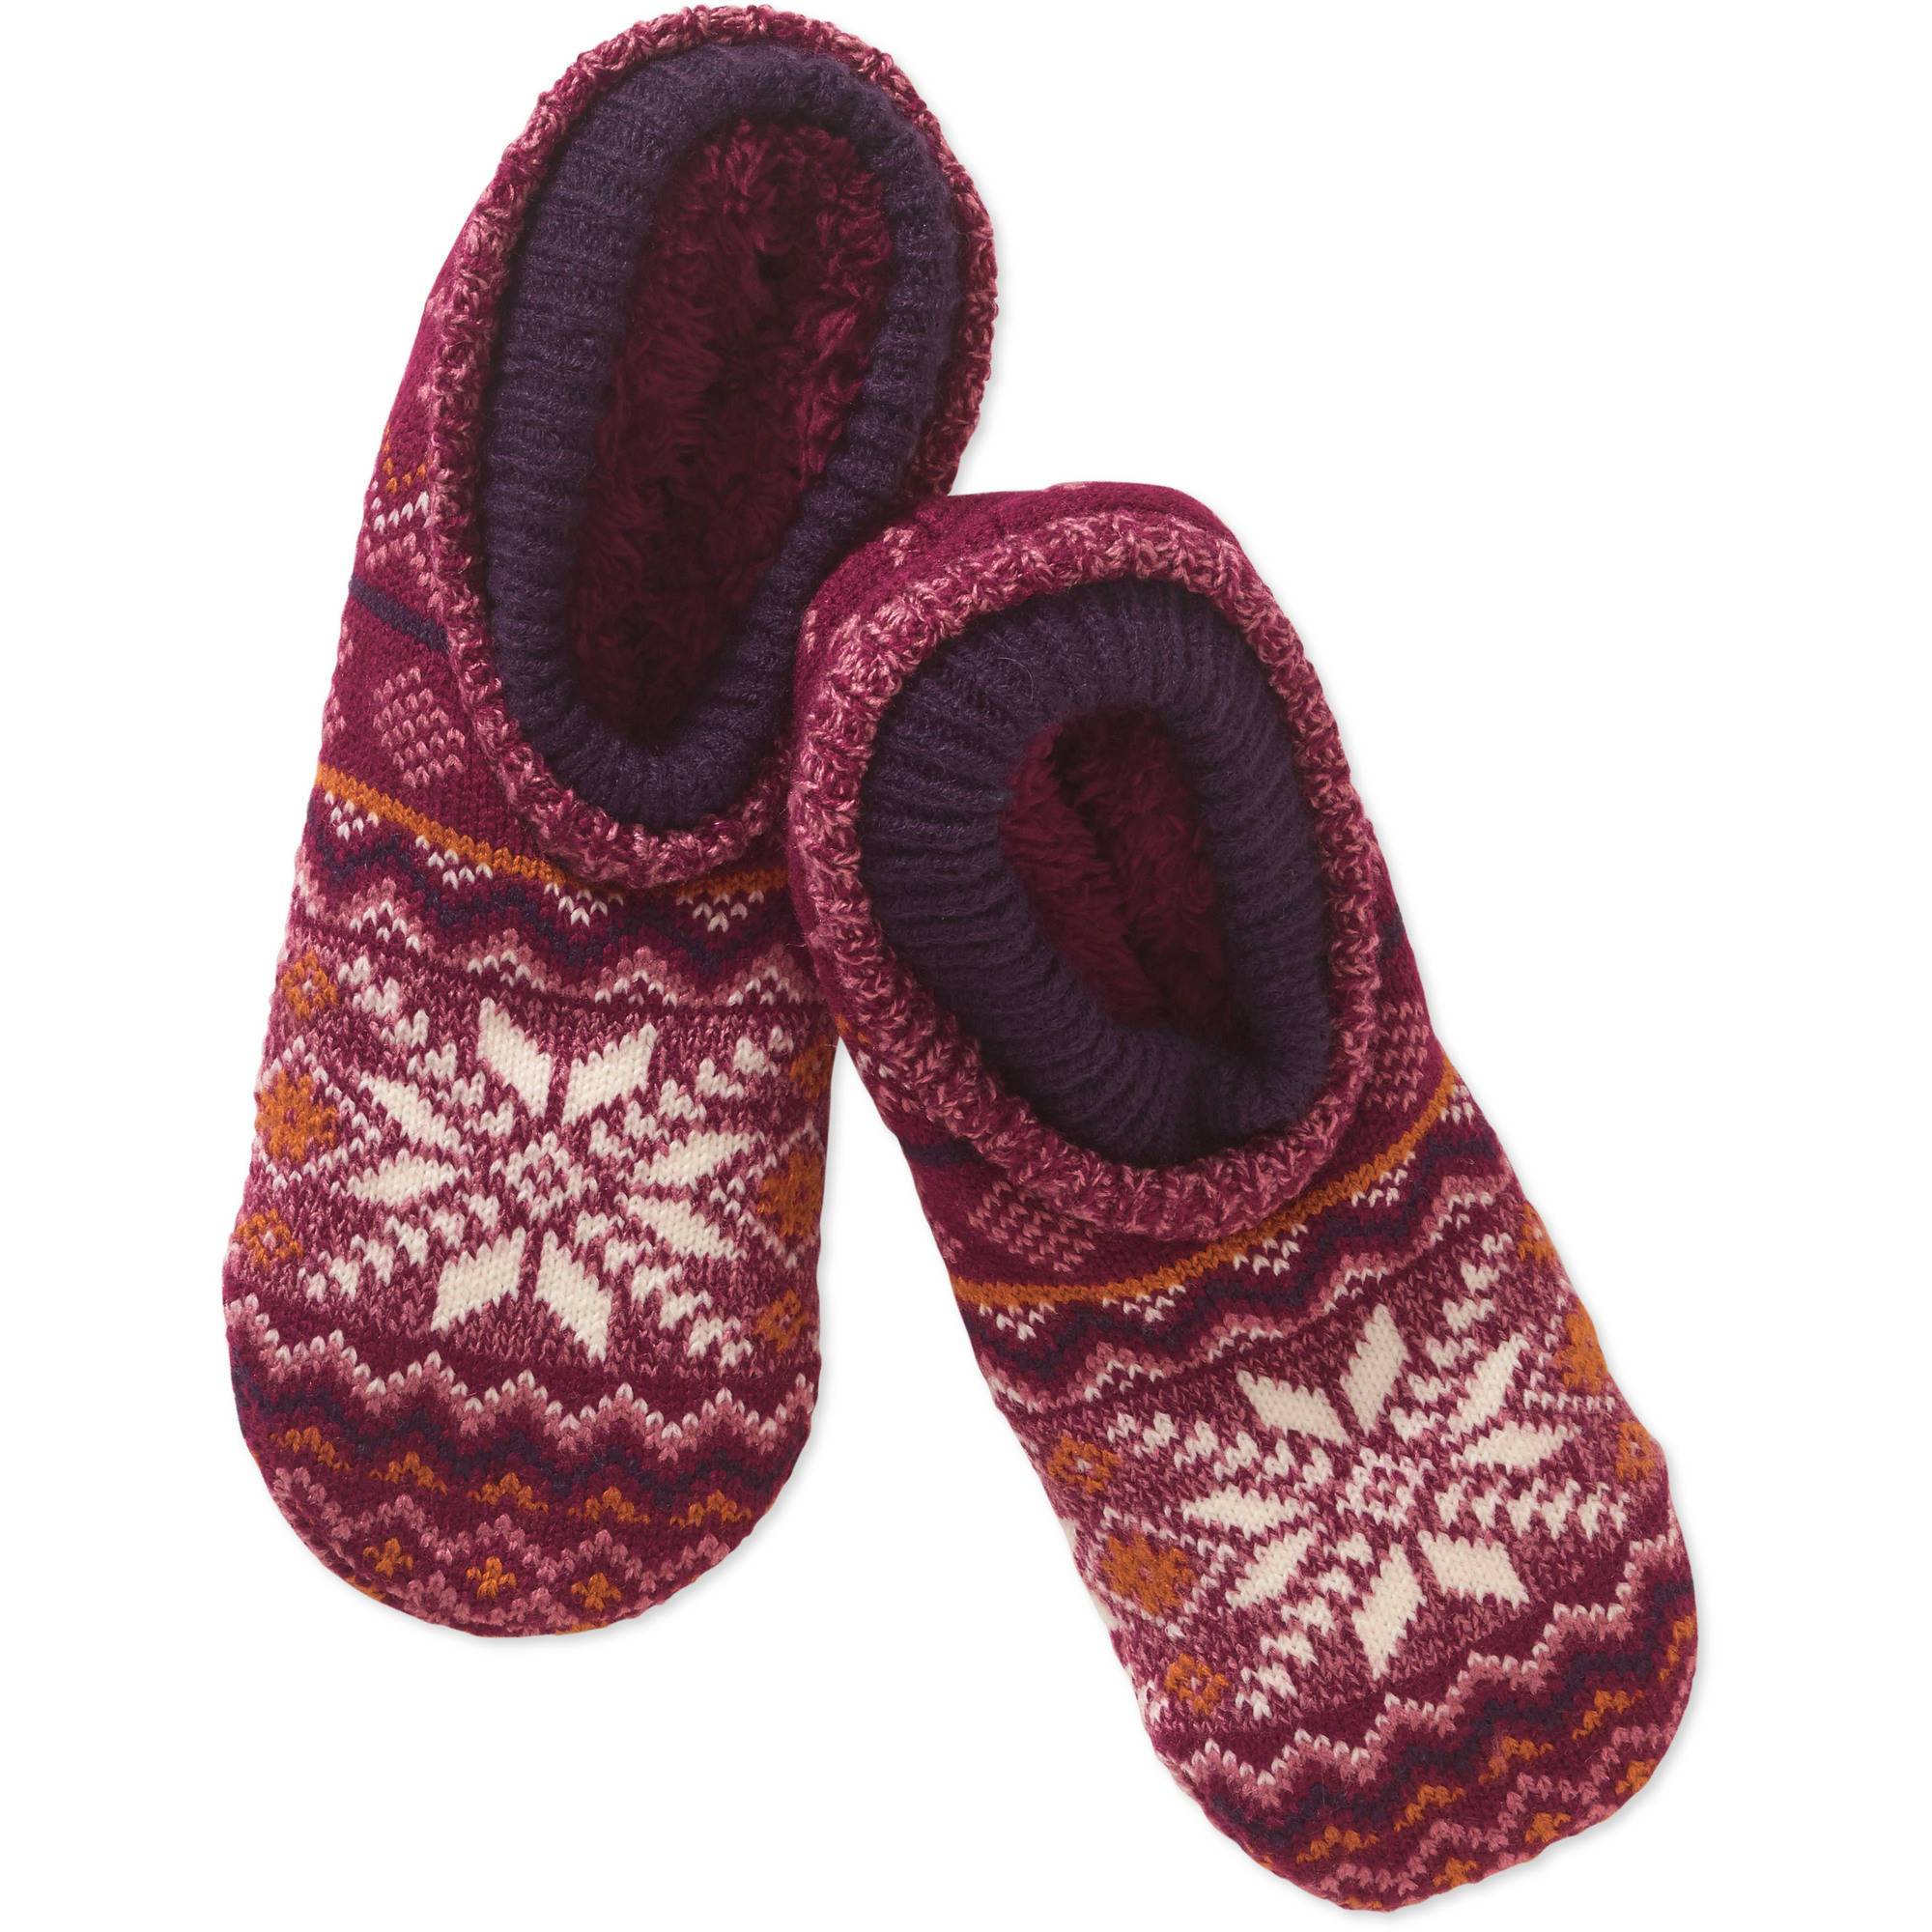 Snowflake Pattern Double Cuff Warmer Slipper Socks with Fur Lining